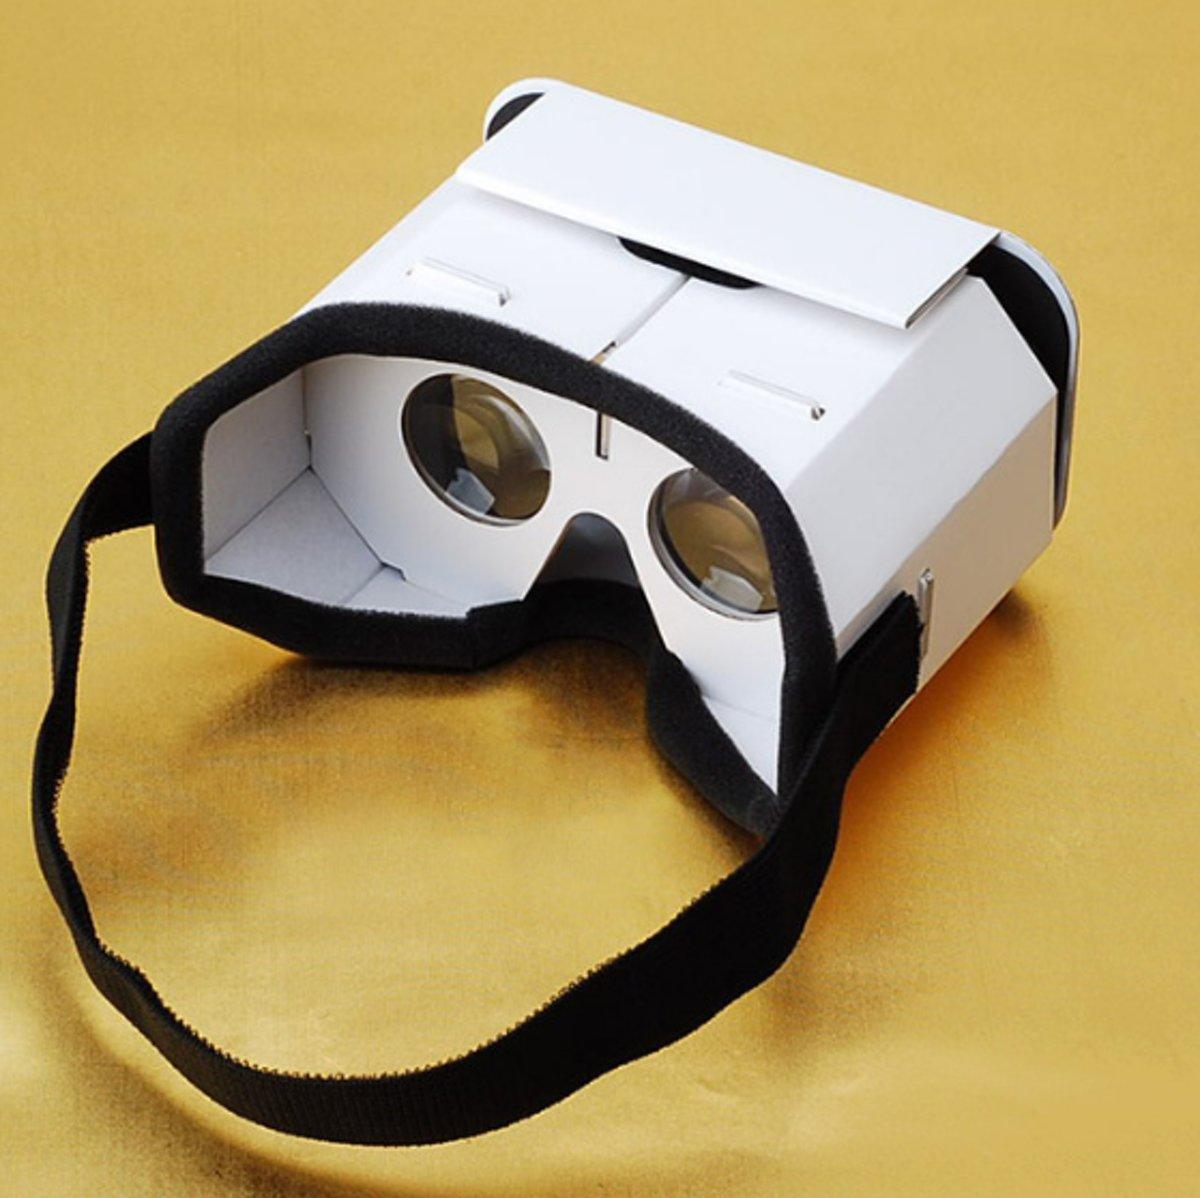 Kartonnen VR Bril - Virtual Reality Bril - VR Bril Voor Smartphone - 3D VR Bril - 3,5 Tot 6 Inch - Wit kopen